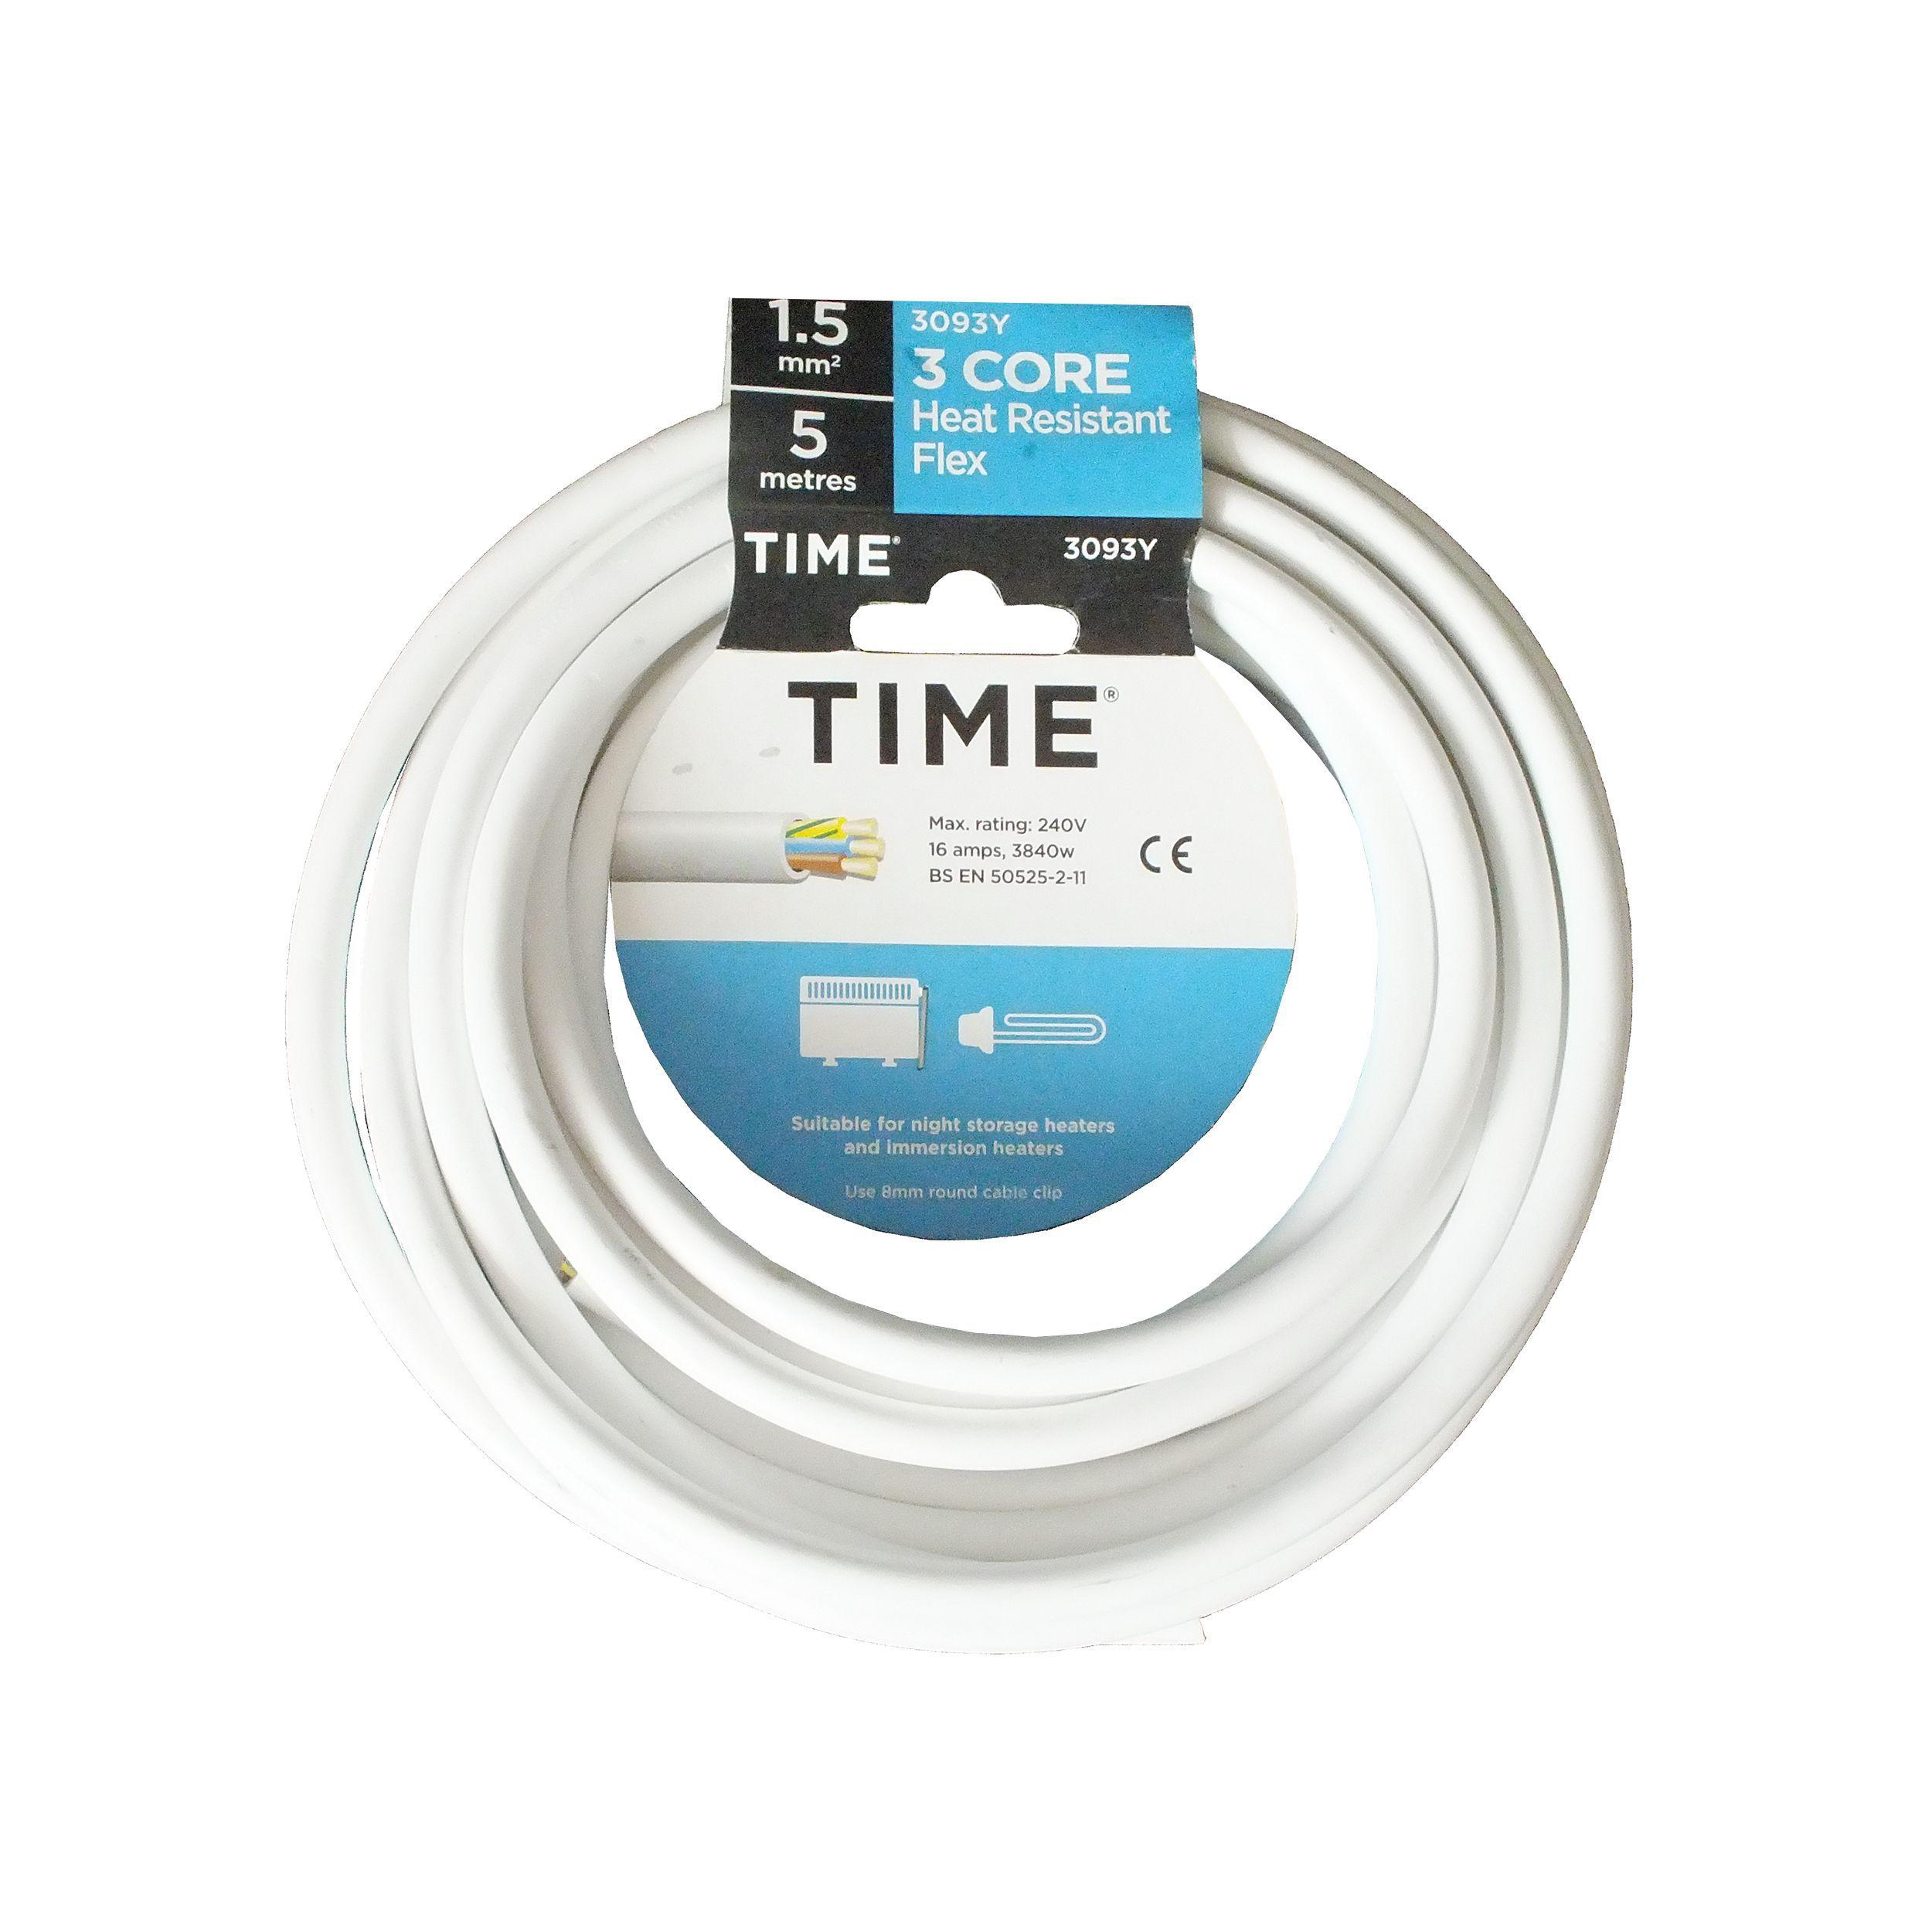 Time 3 core Heat resistant flexible cable 1.5mm² 3093Y White 5 m ...